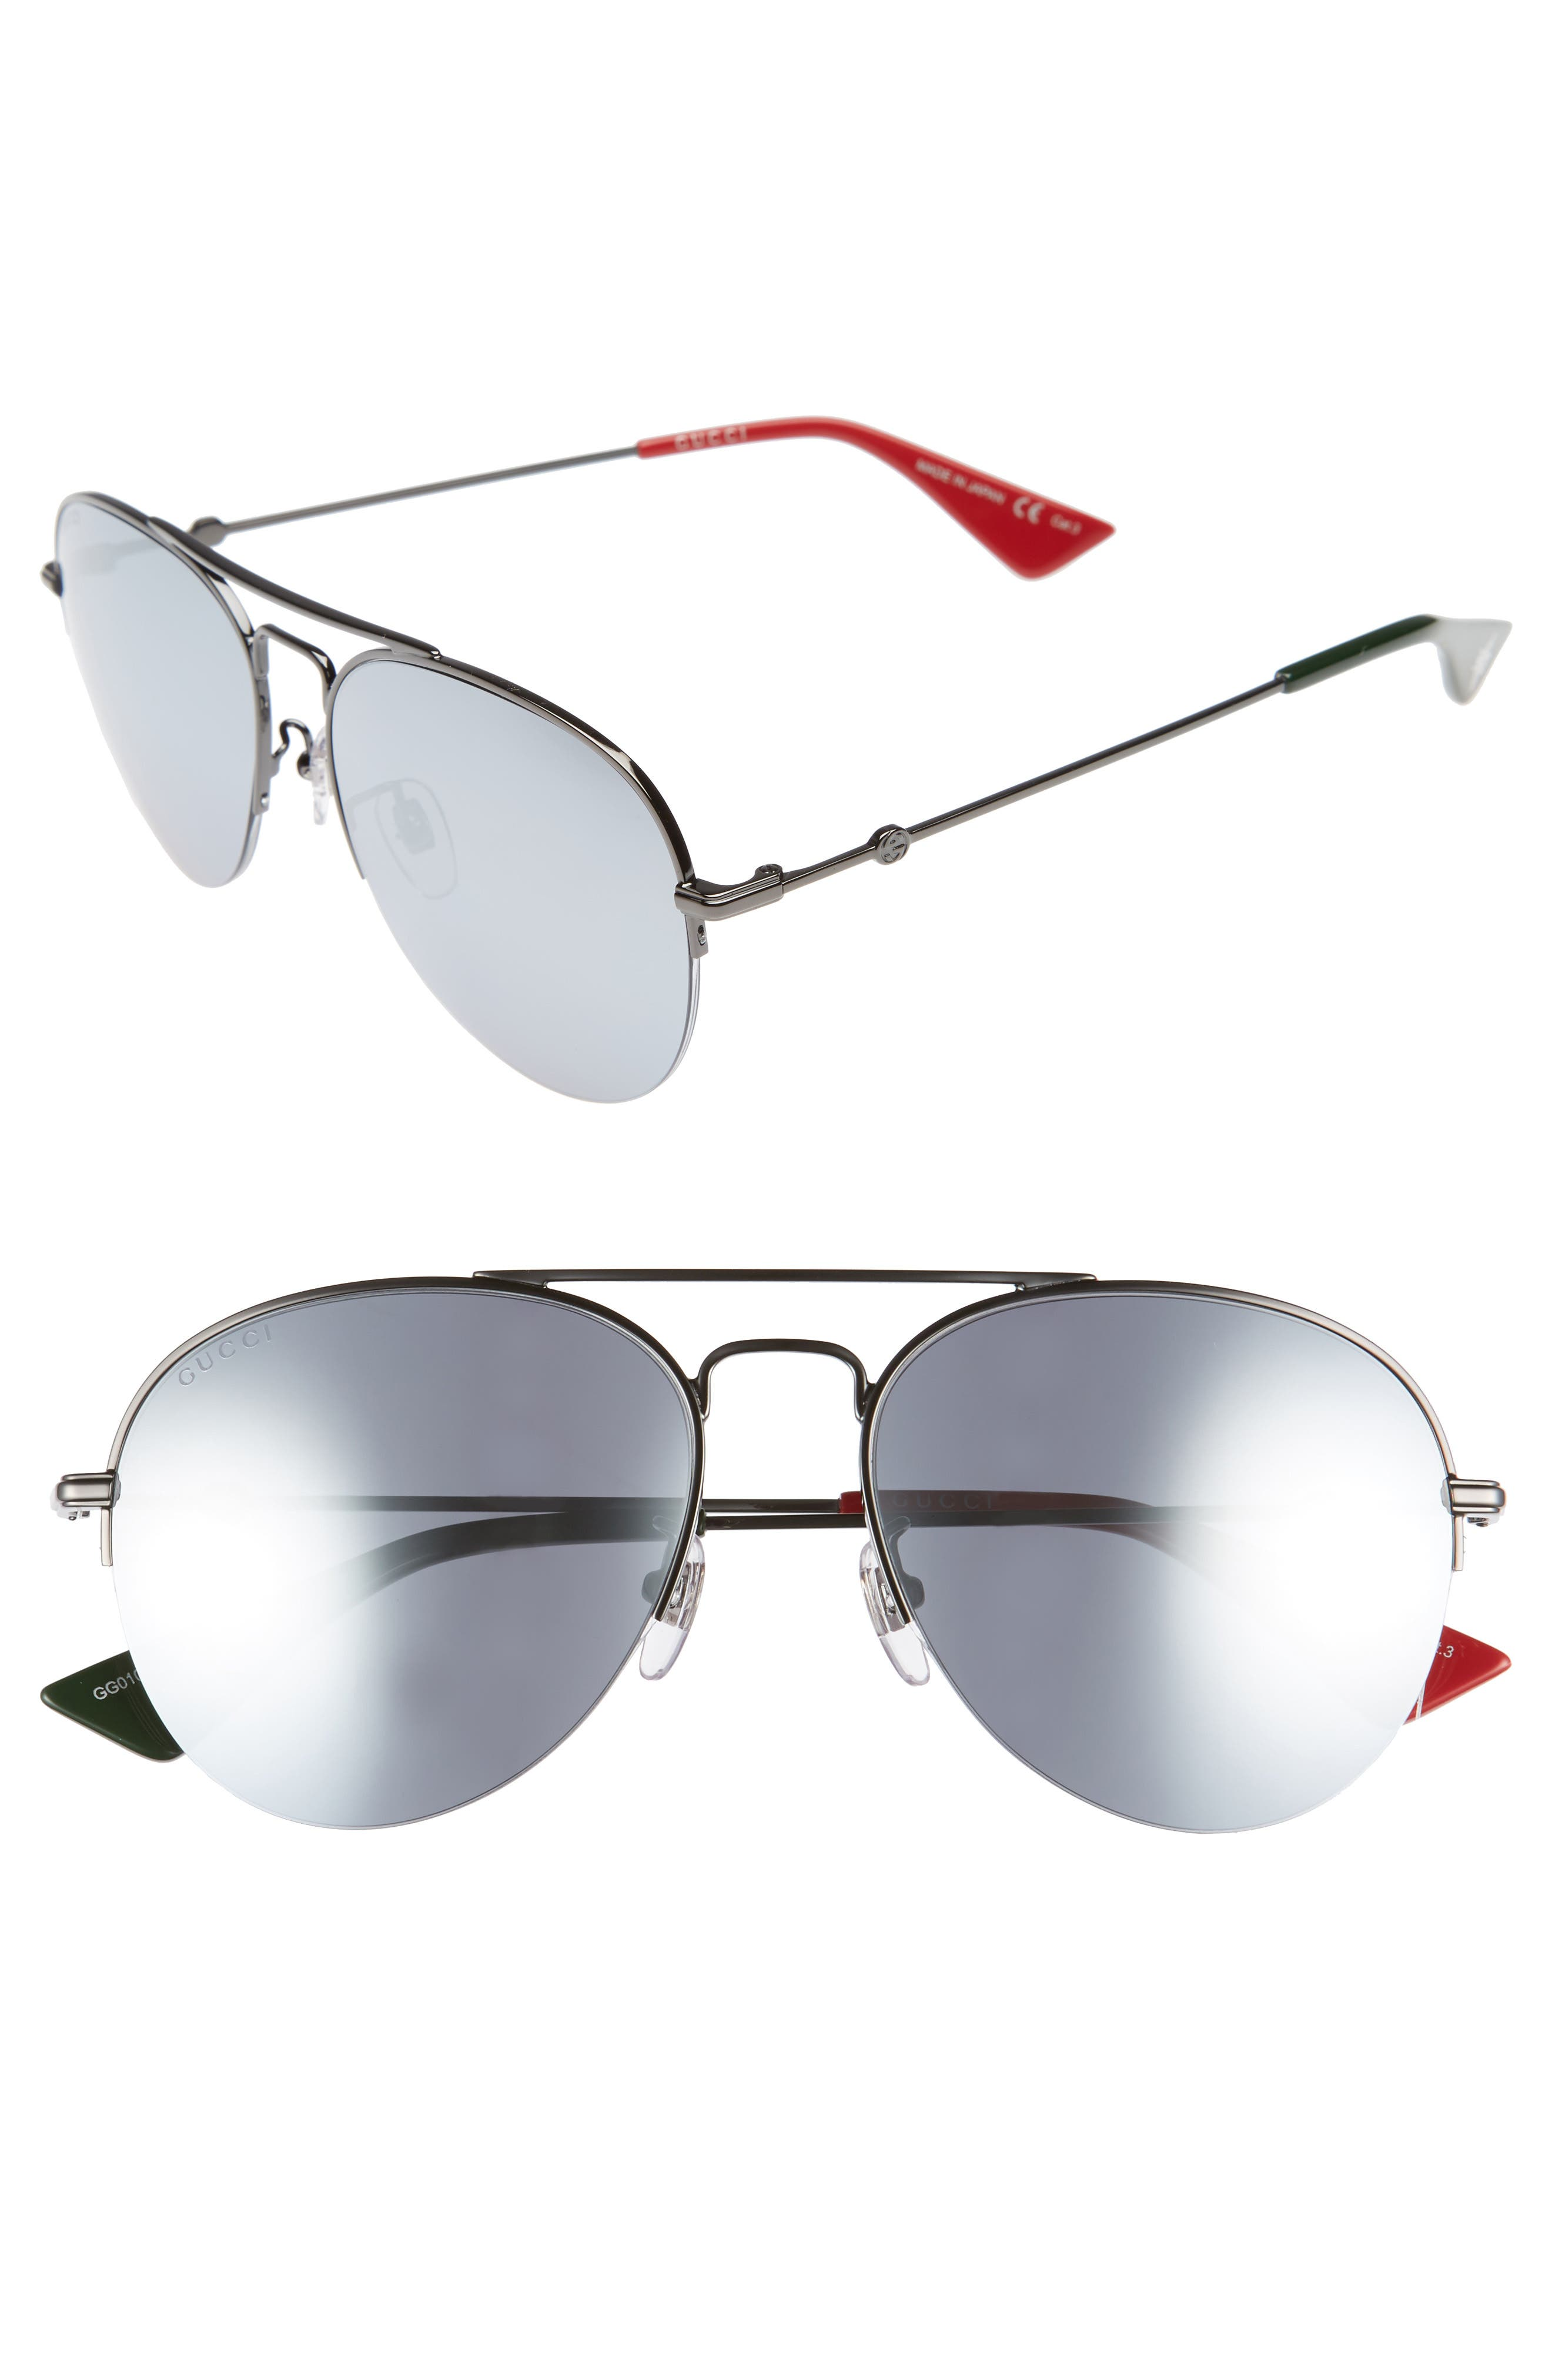 56mm Aviator Sunglasses,                         Main,                         color, Ruthenium/ Silver